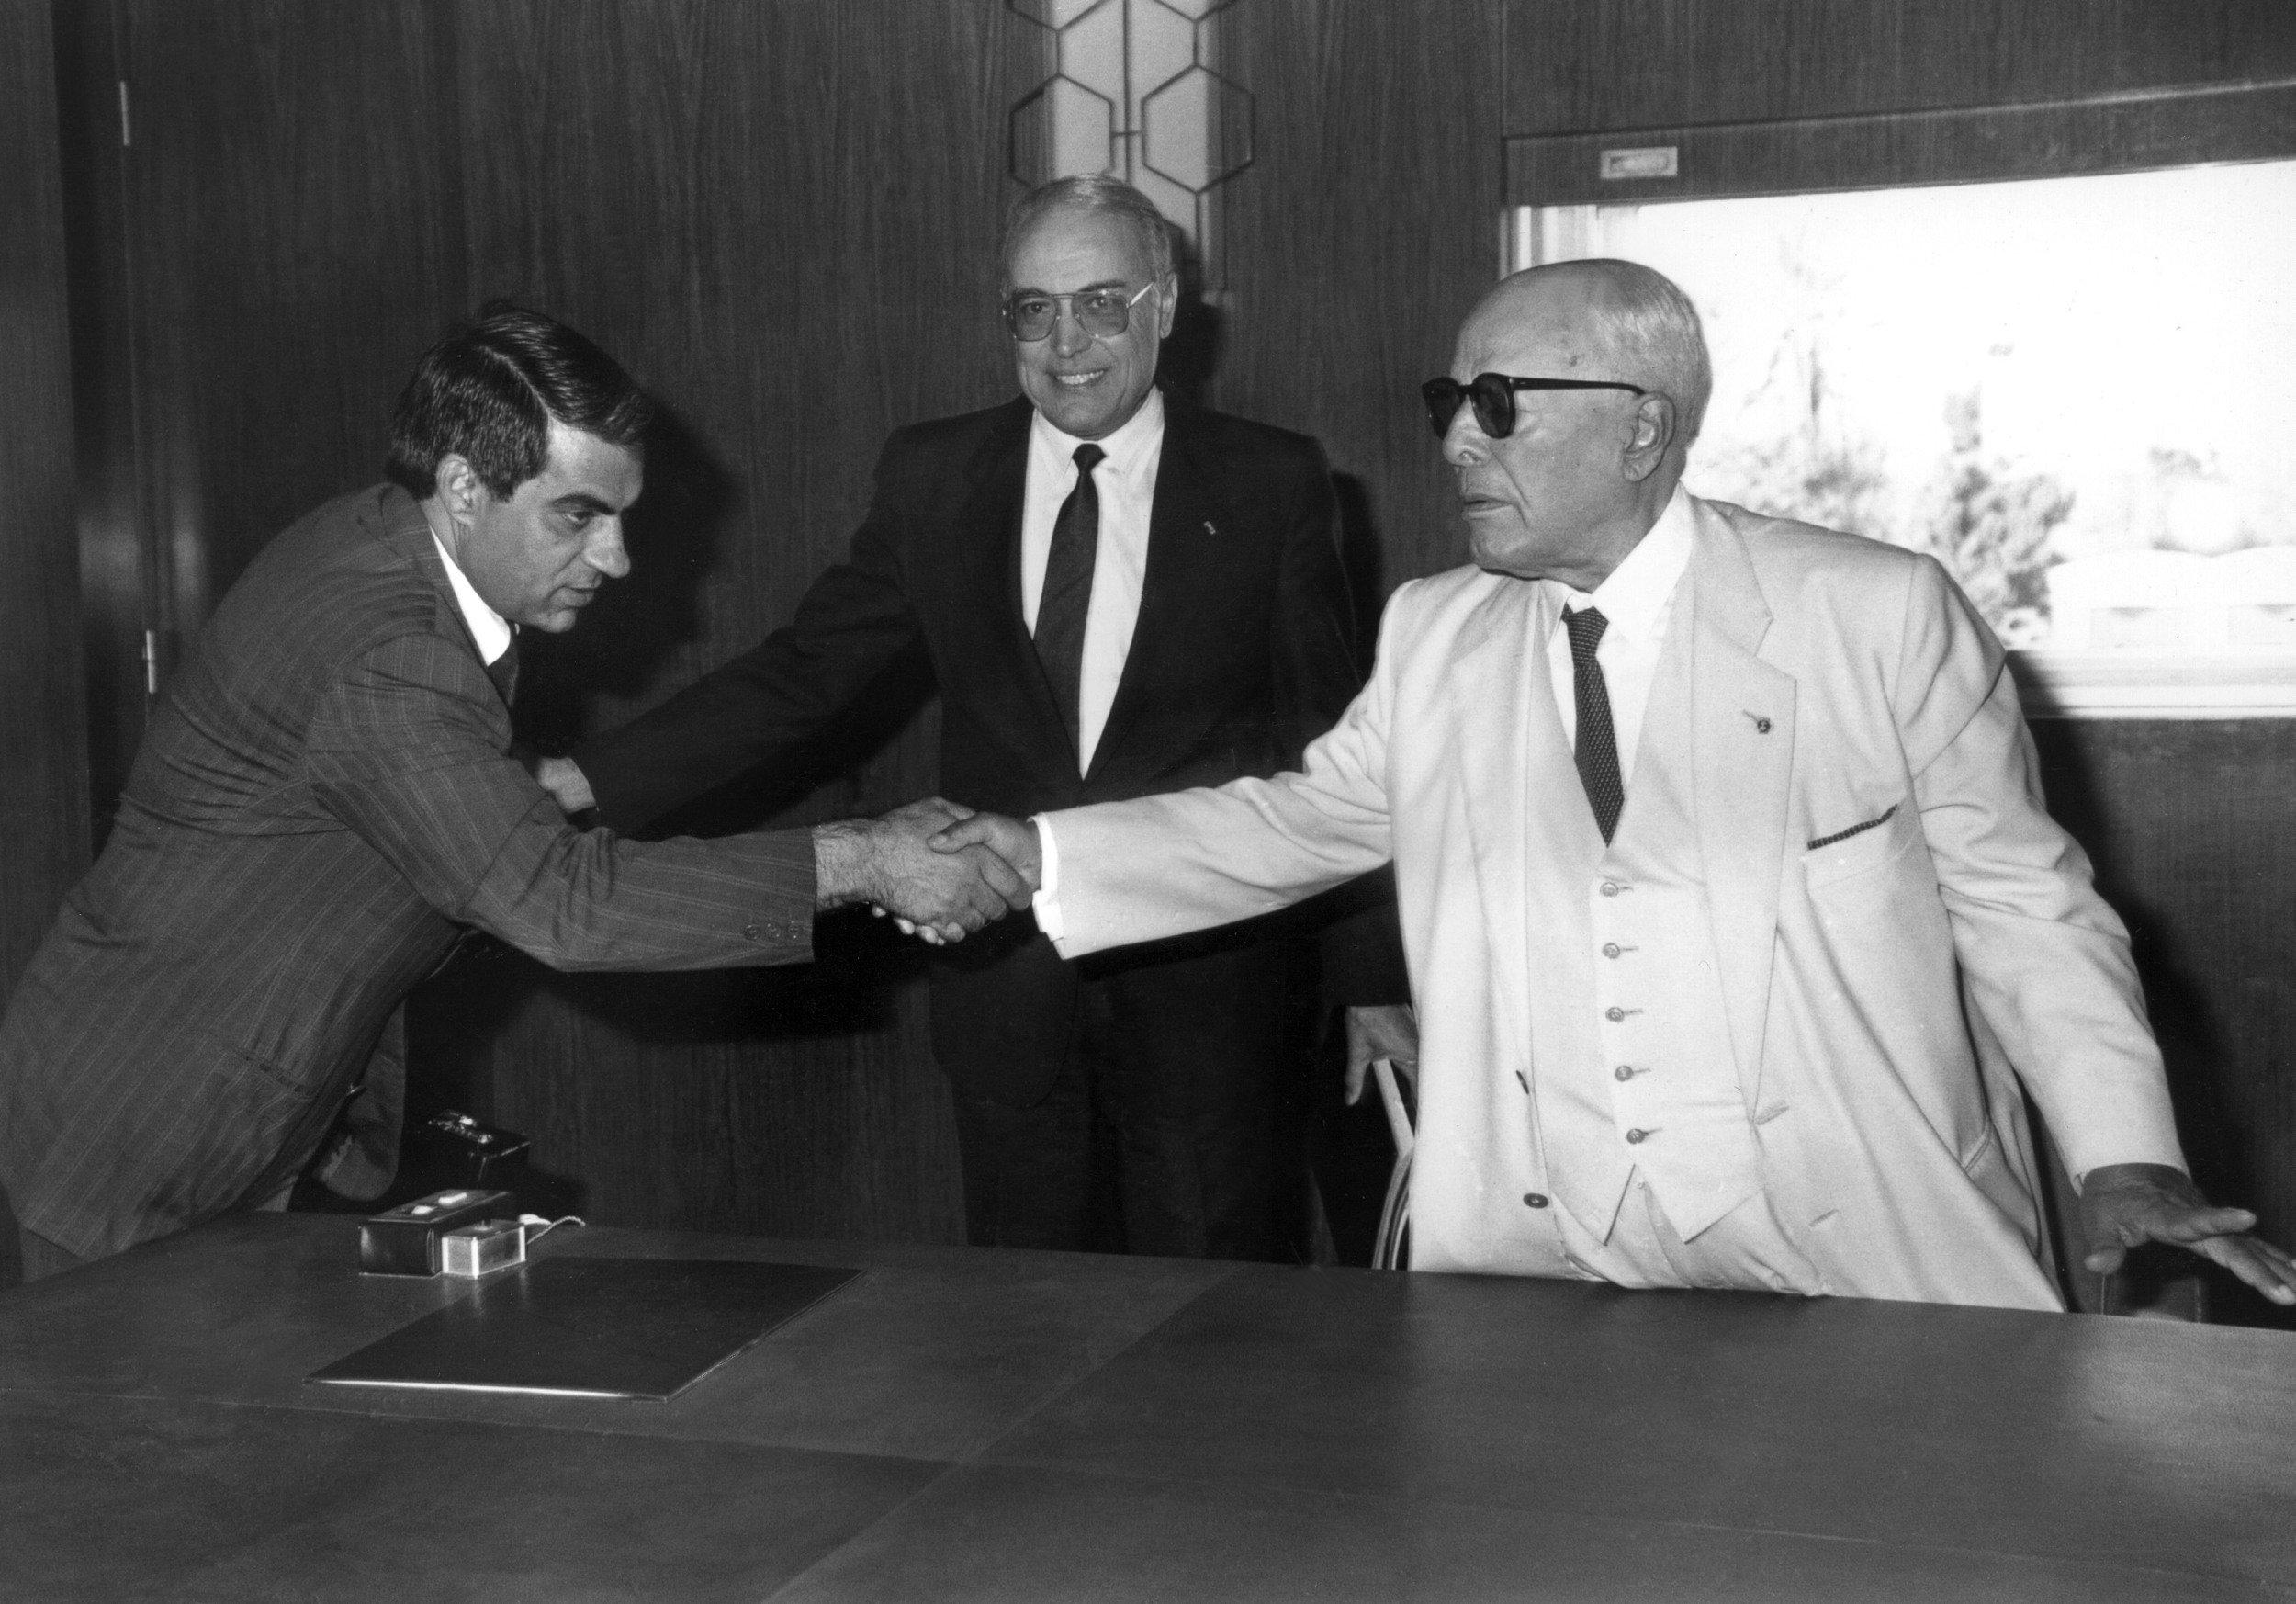 Former Tunisian President Ben Ali dies in exile